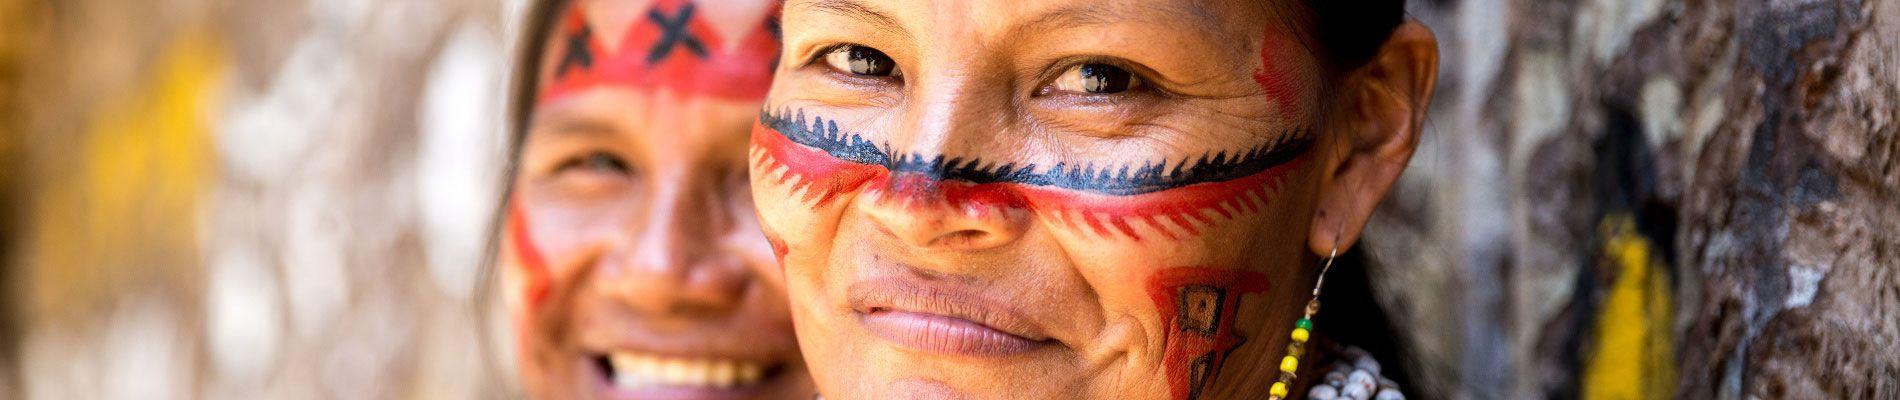 bresil-peuple-indigene-amazonie-st